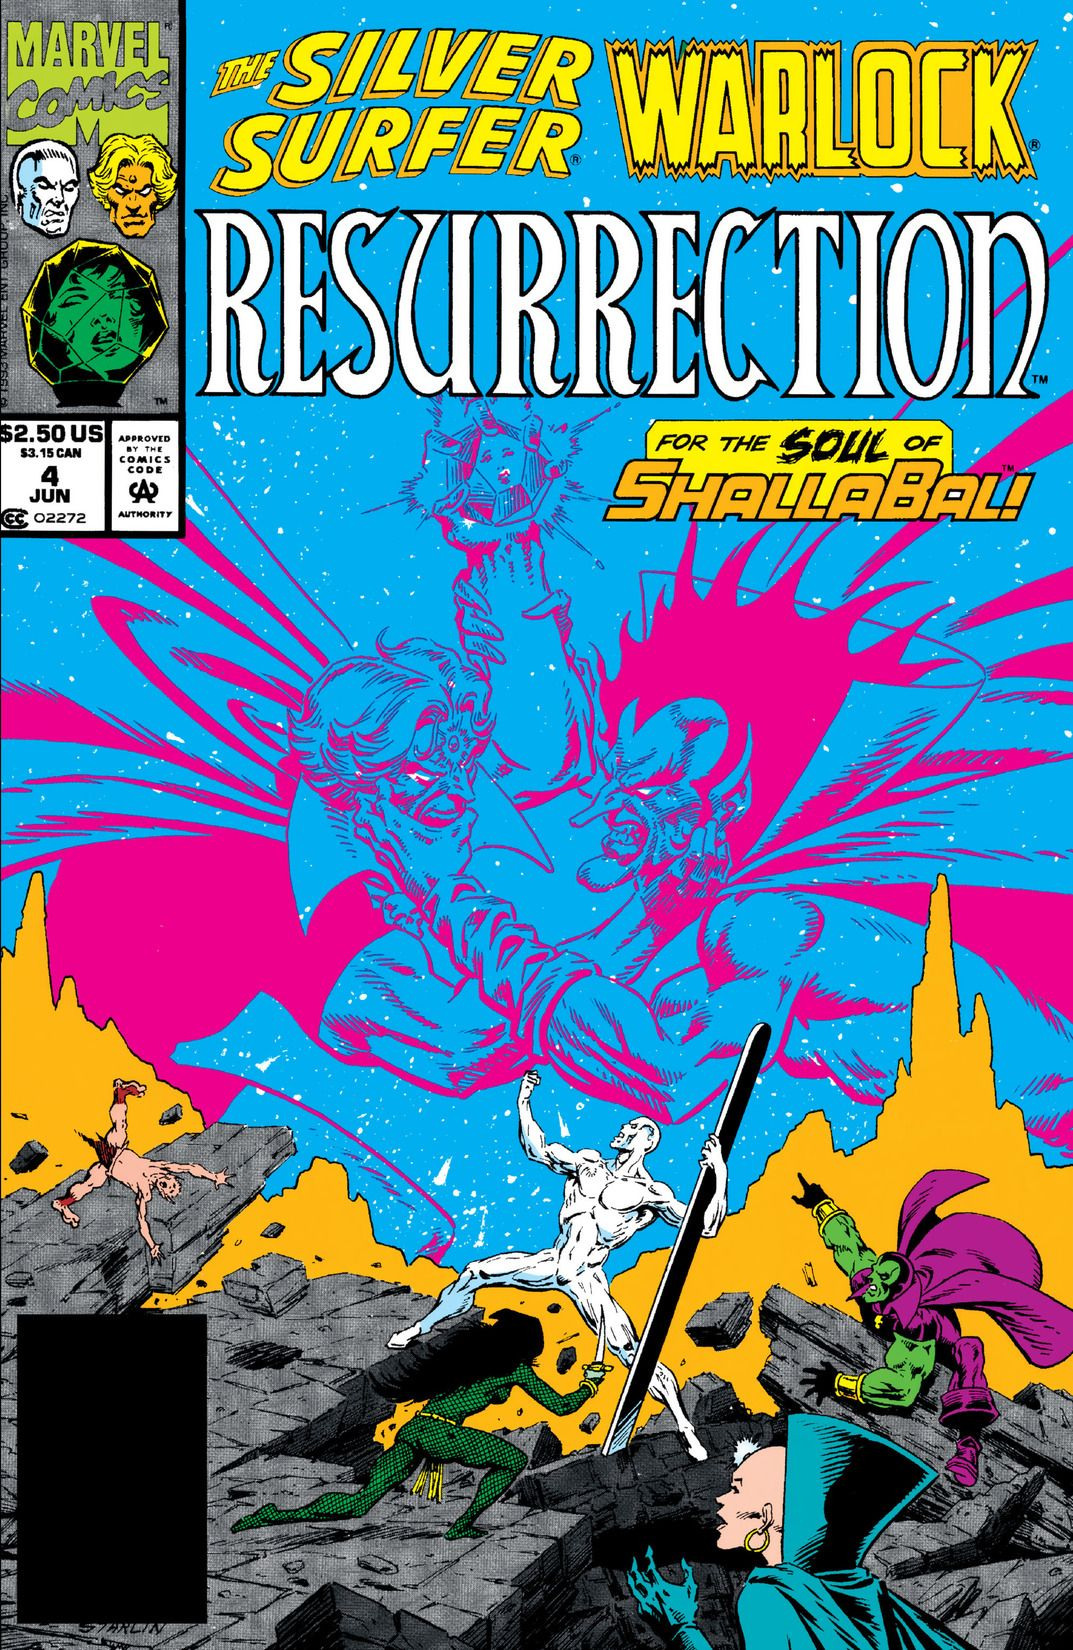 Silver Surfer/Warlock: Resurrection Vol 1 4